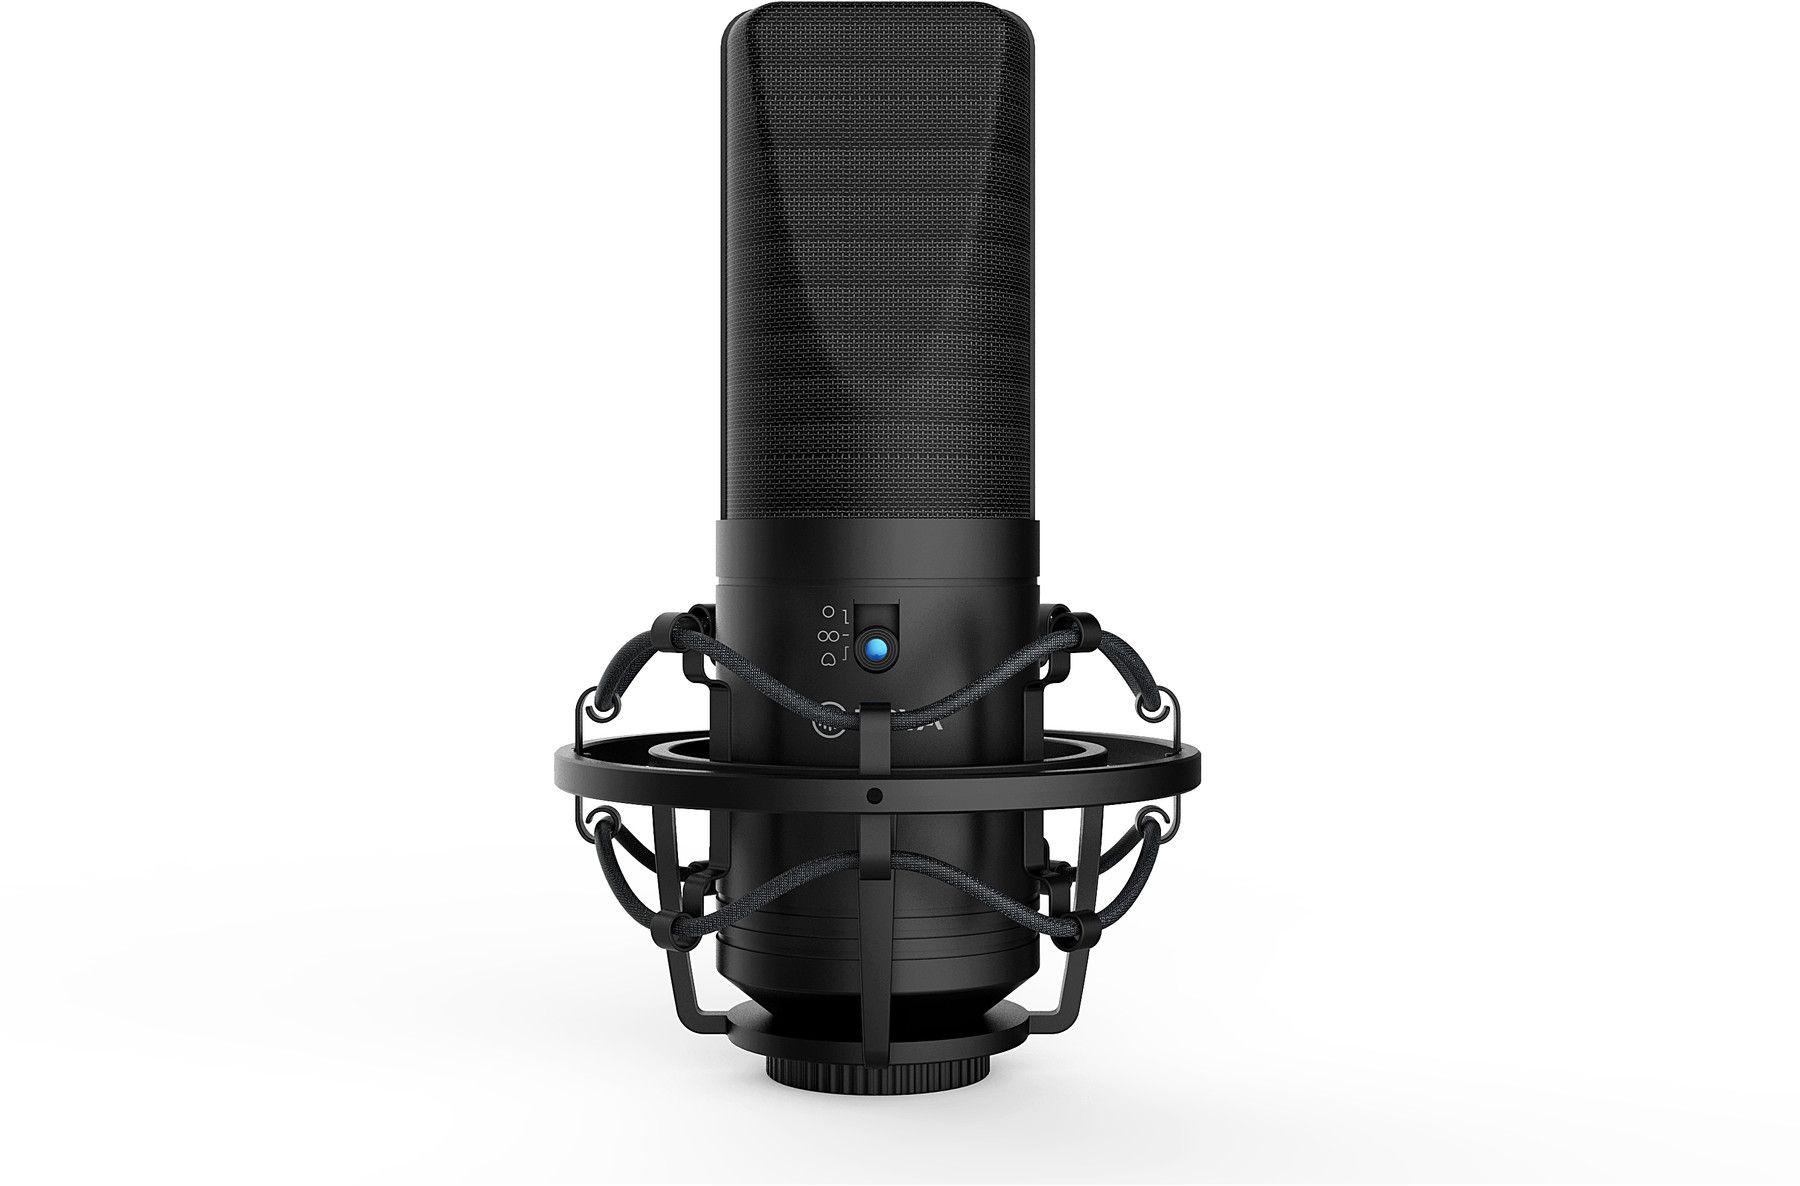 Boya BY-M1000 Diaphragm Condenser Microphone